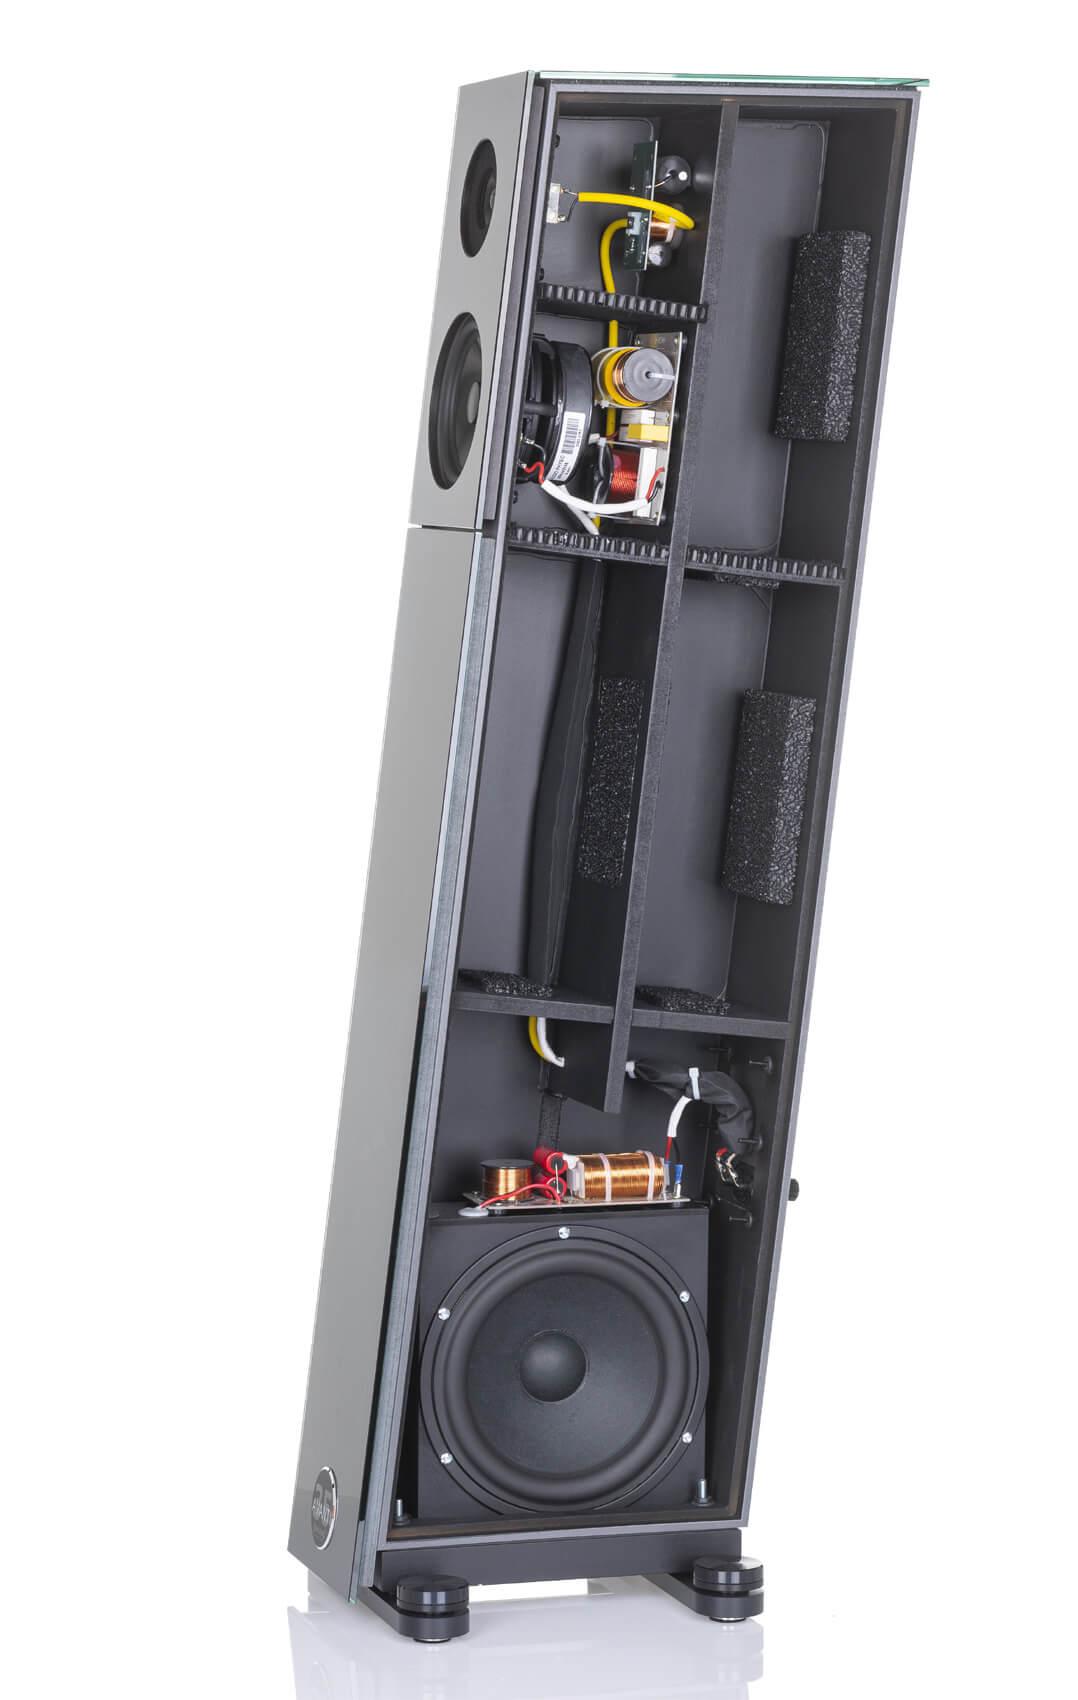 Audio Physic Avanti 35 Standlautsprecher - Treiberterchnik